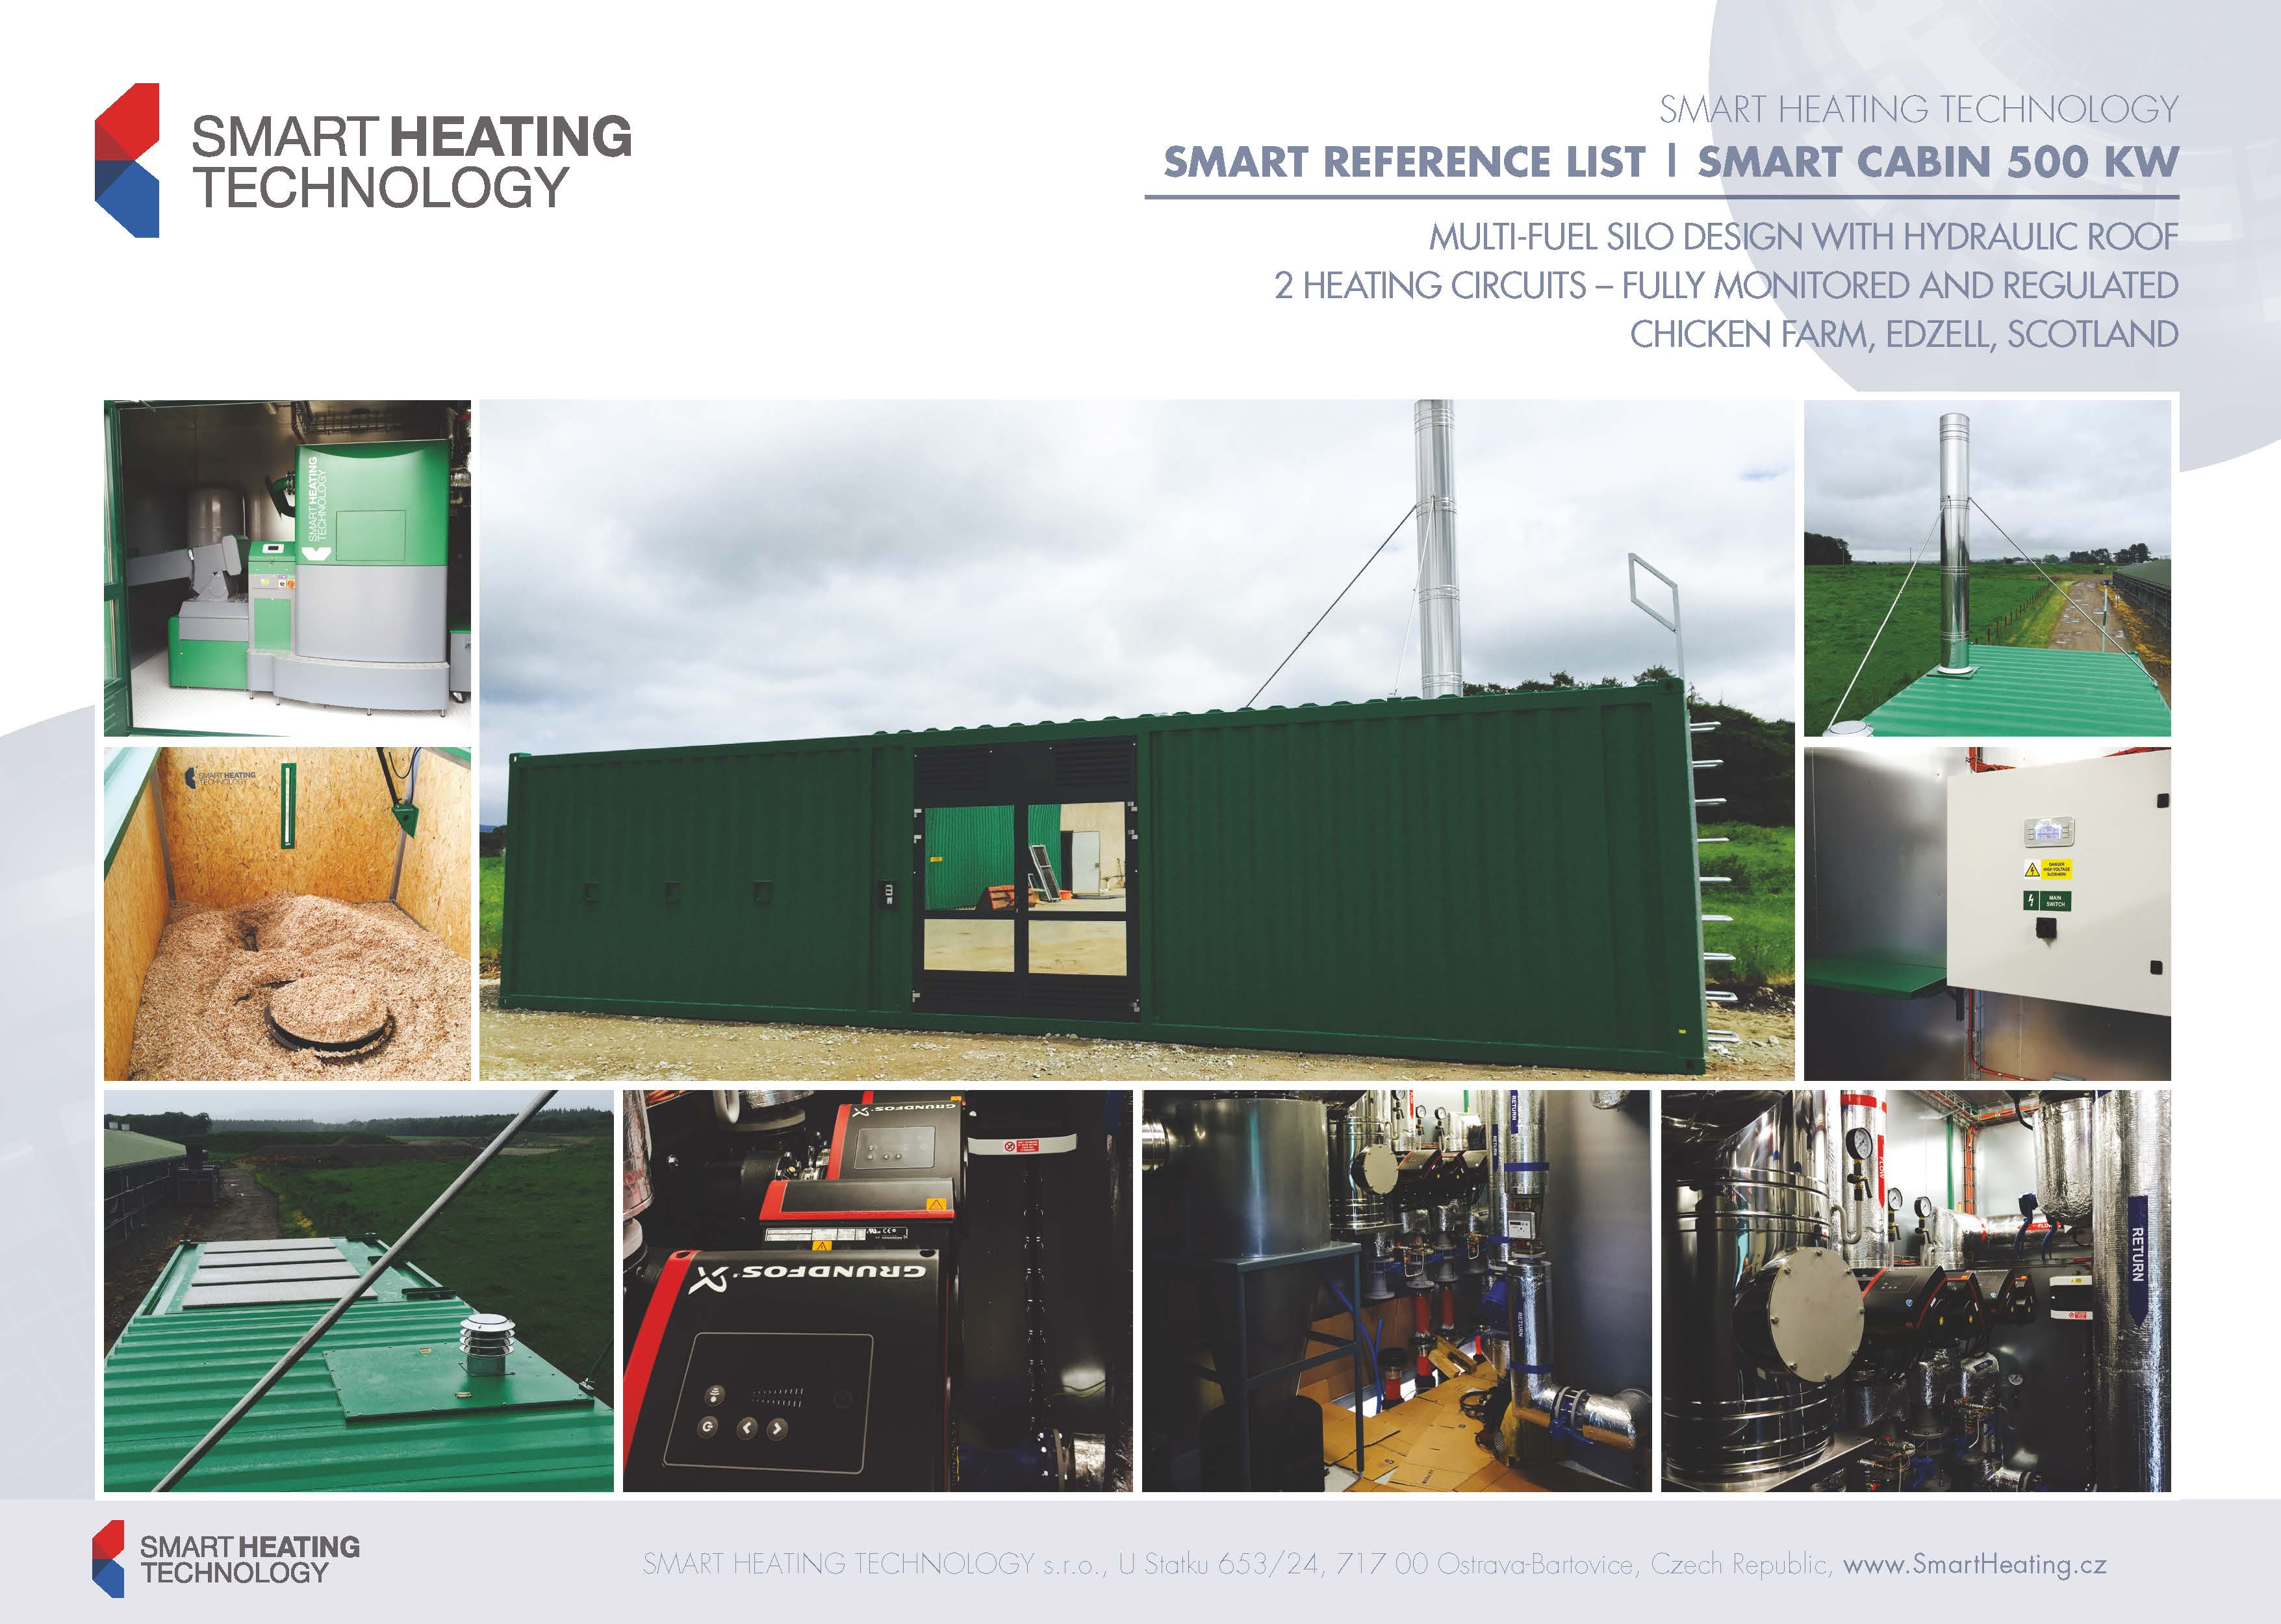 smart-cabin-500-kw-edzell